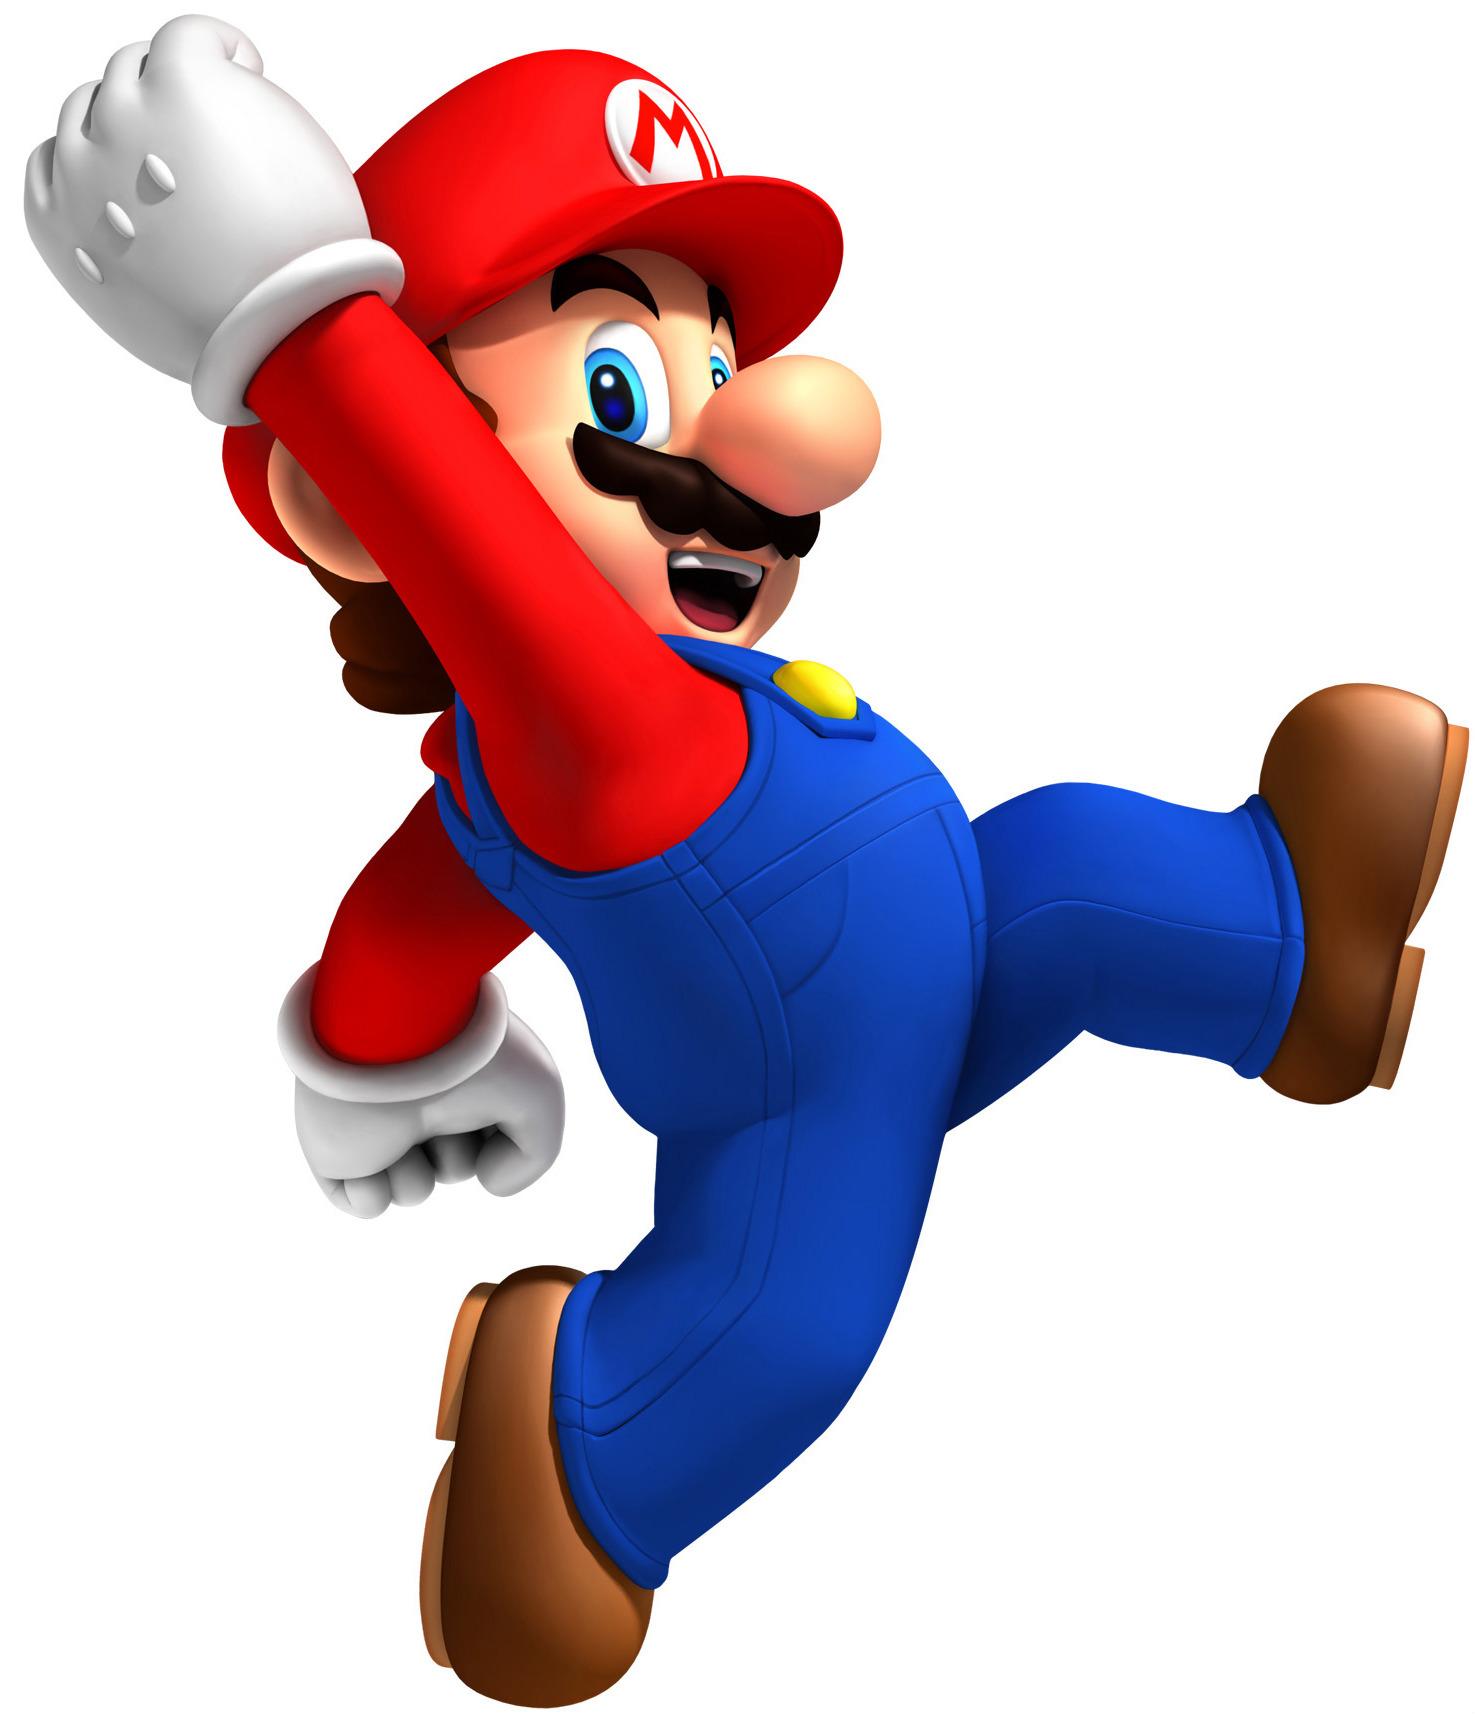 Full resolution PlusPng.com  - Mario PNG